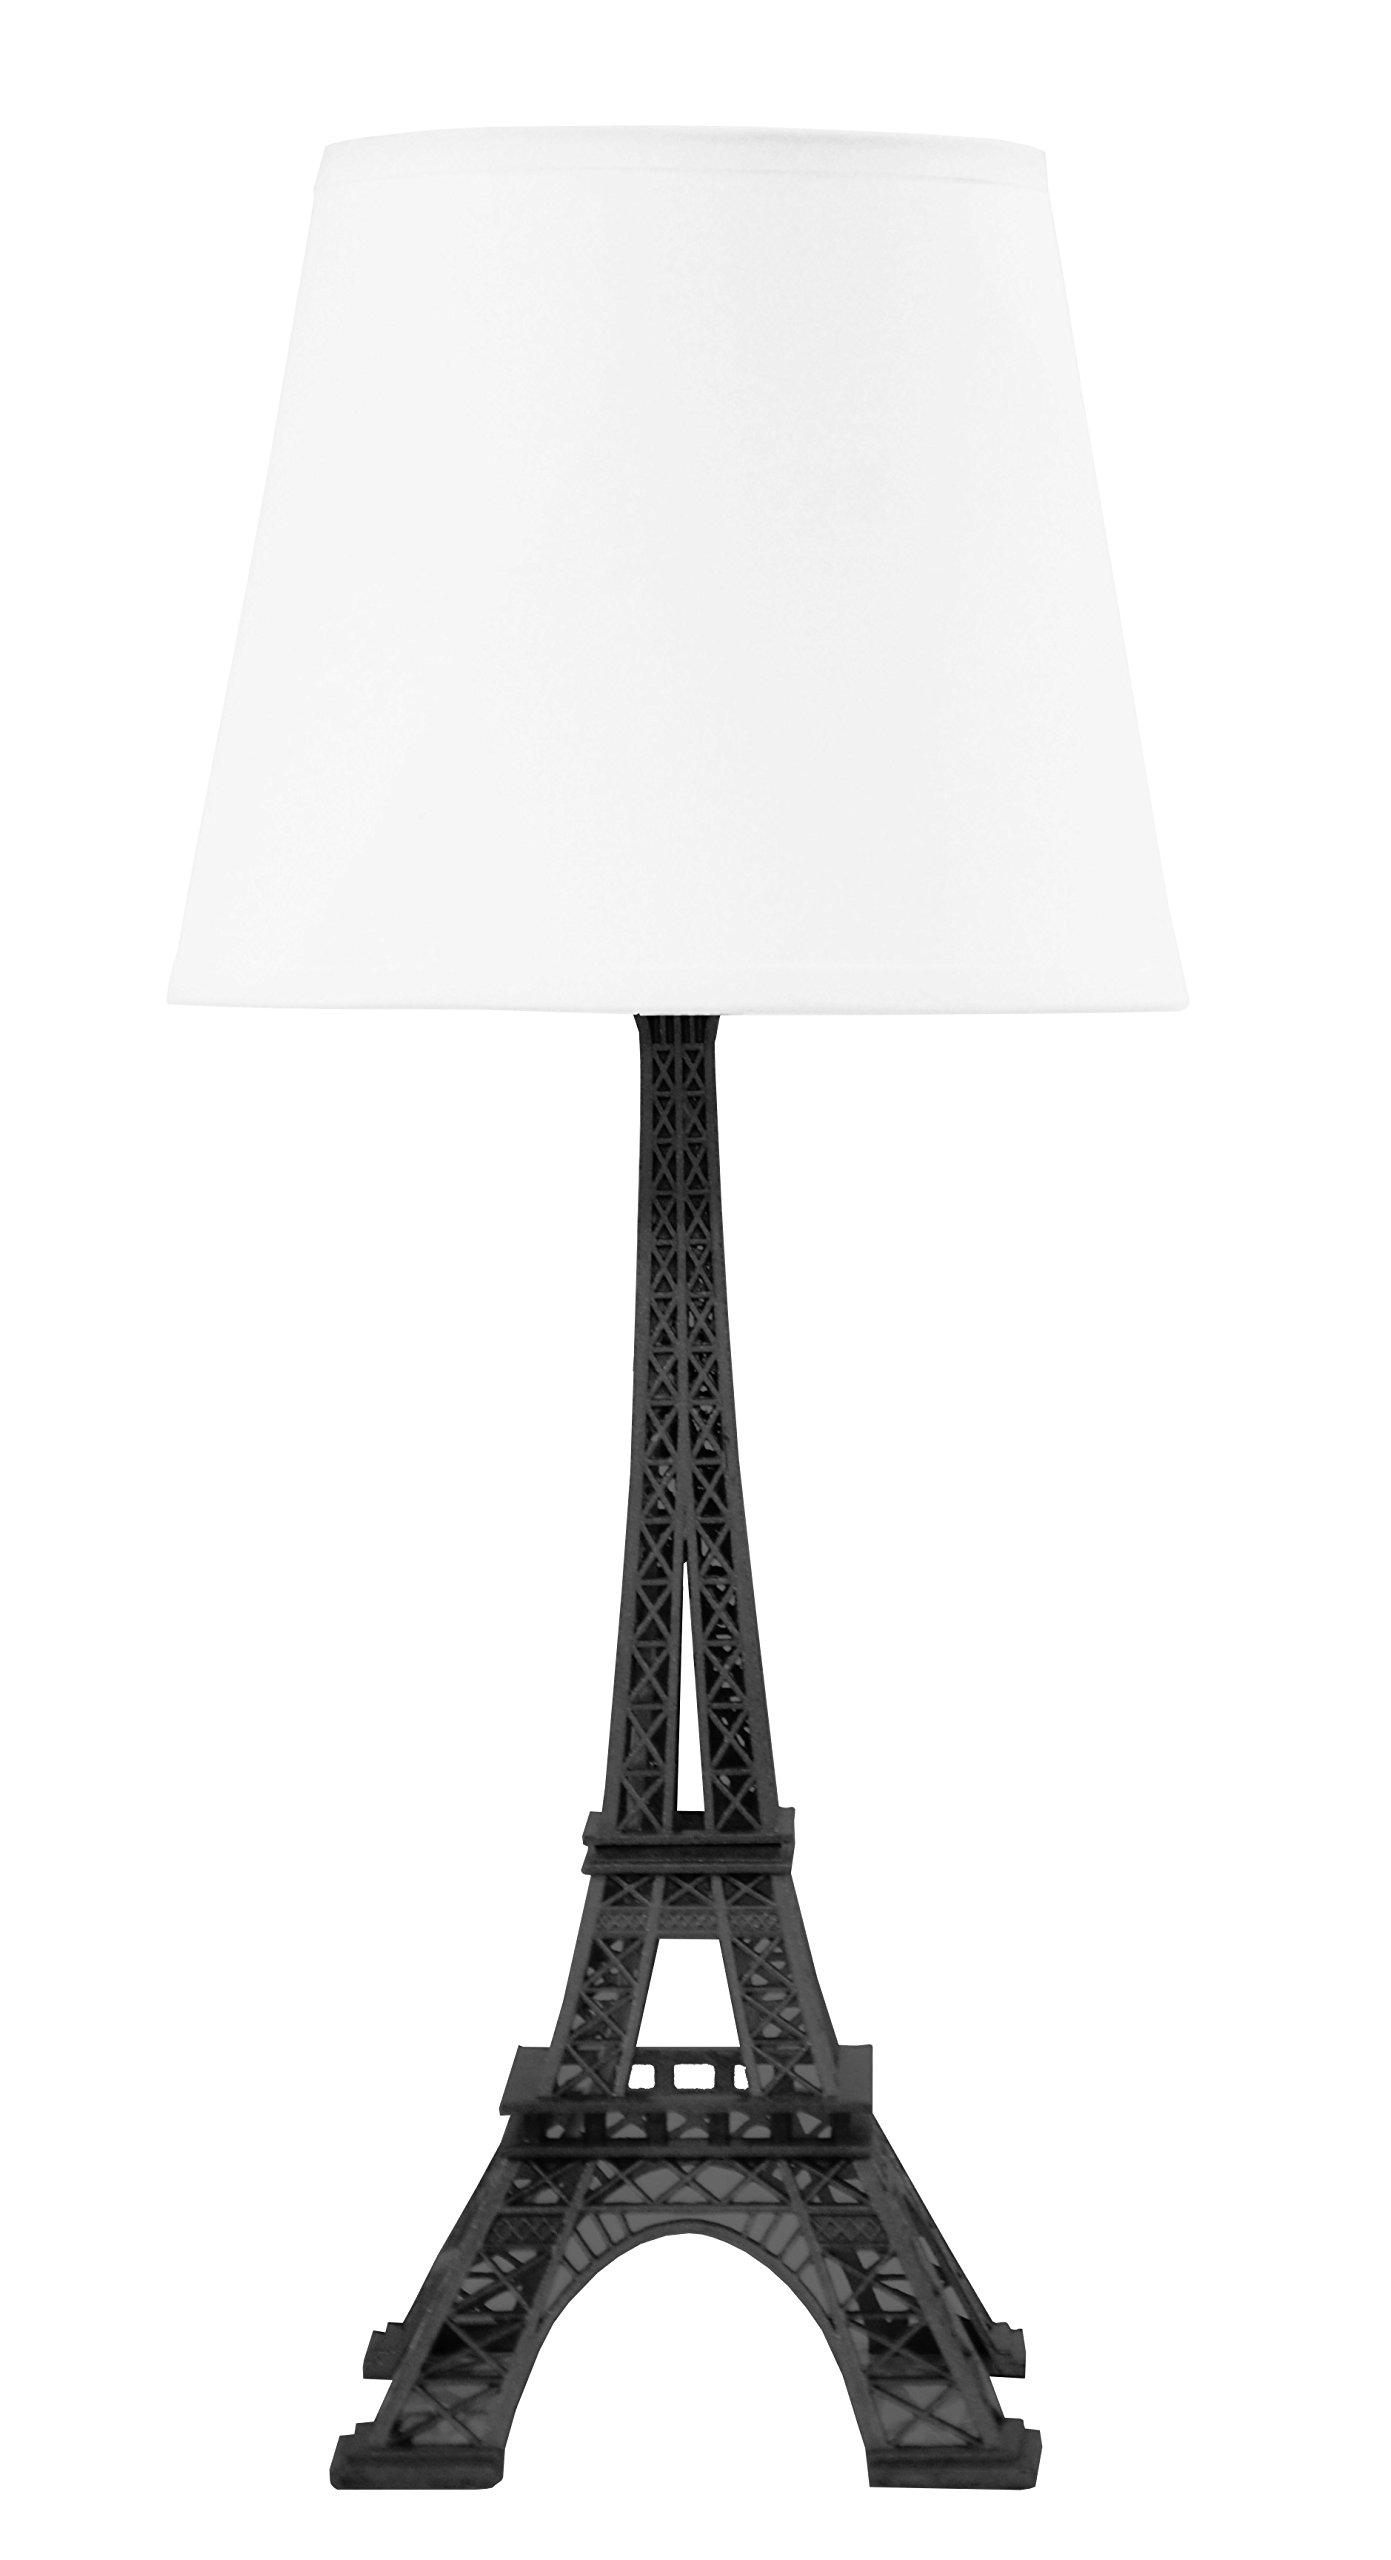 Urban Shop Eiffel Tower Table Lamp, 14''